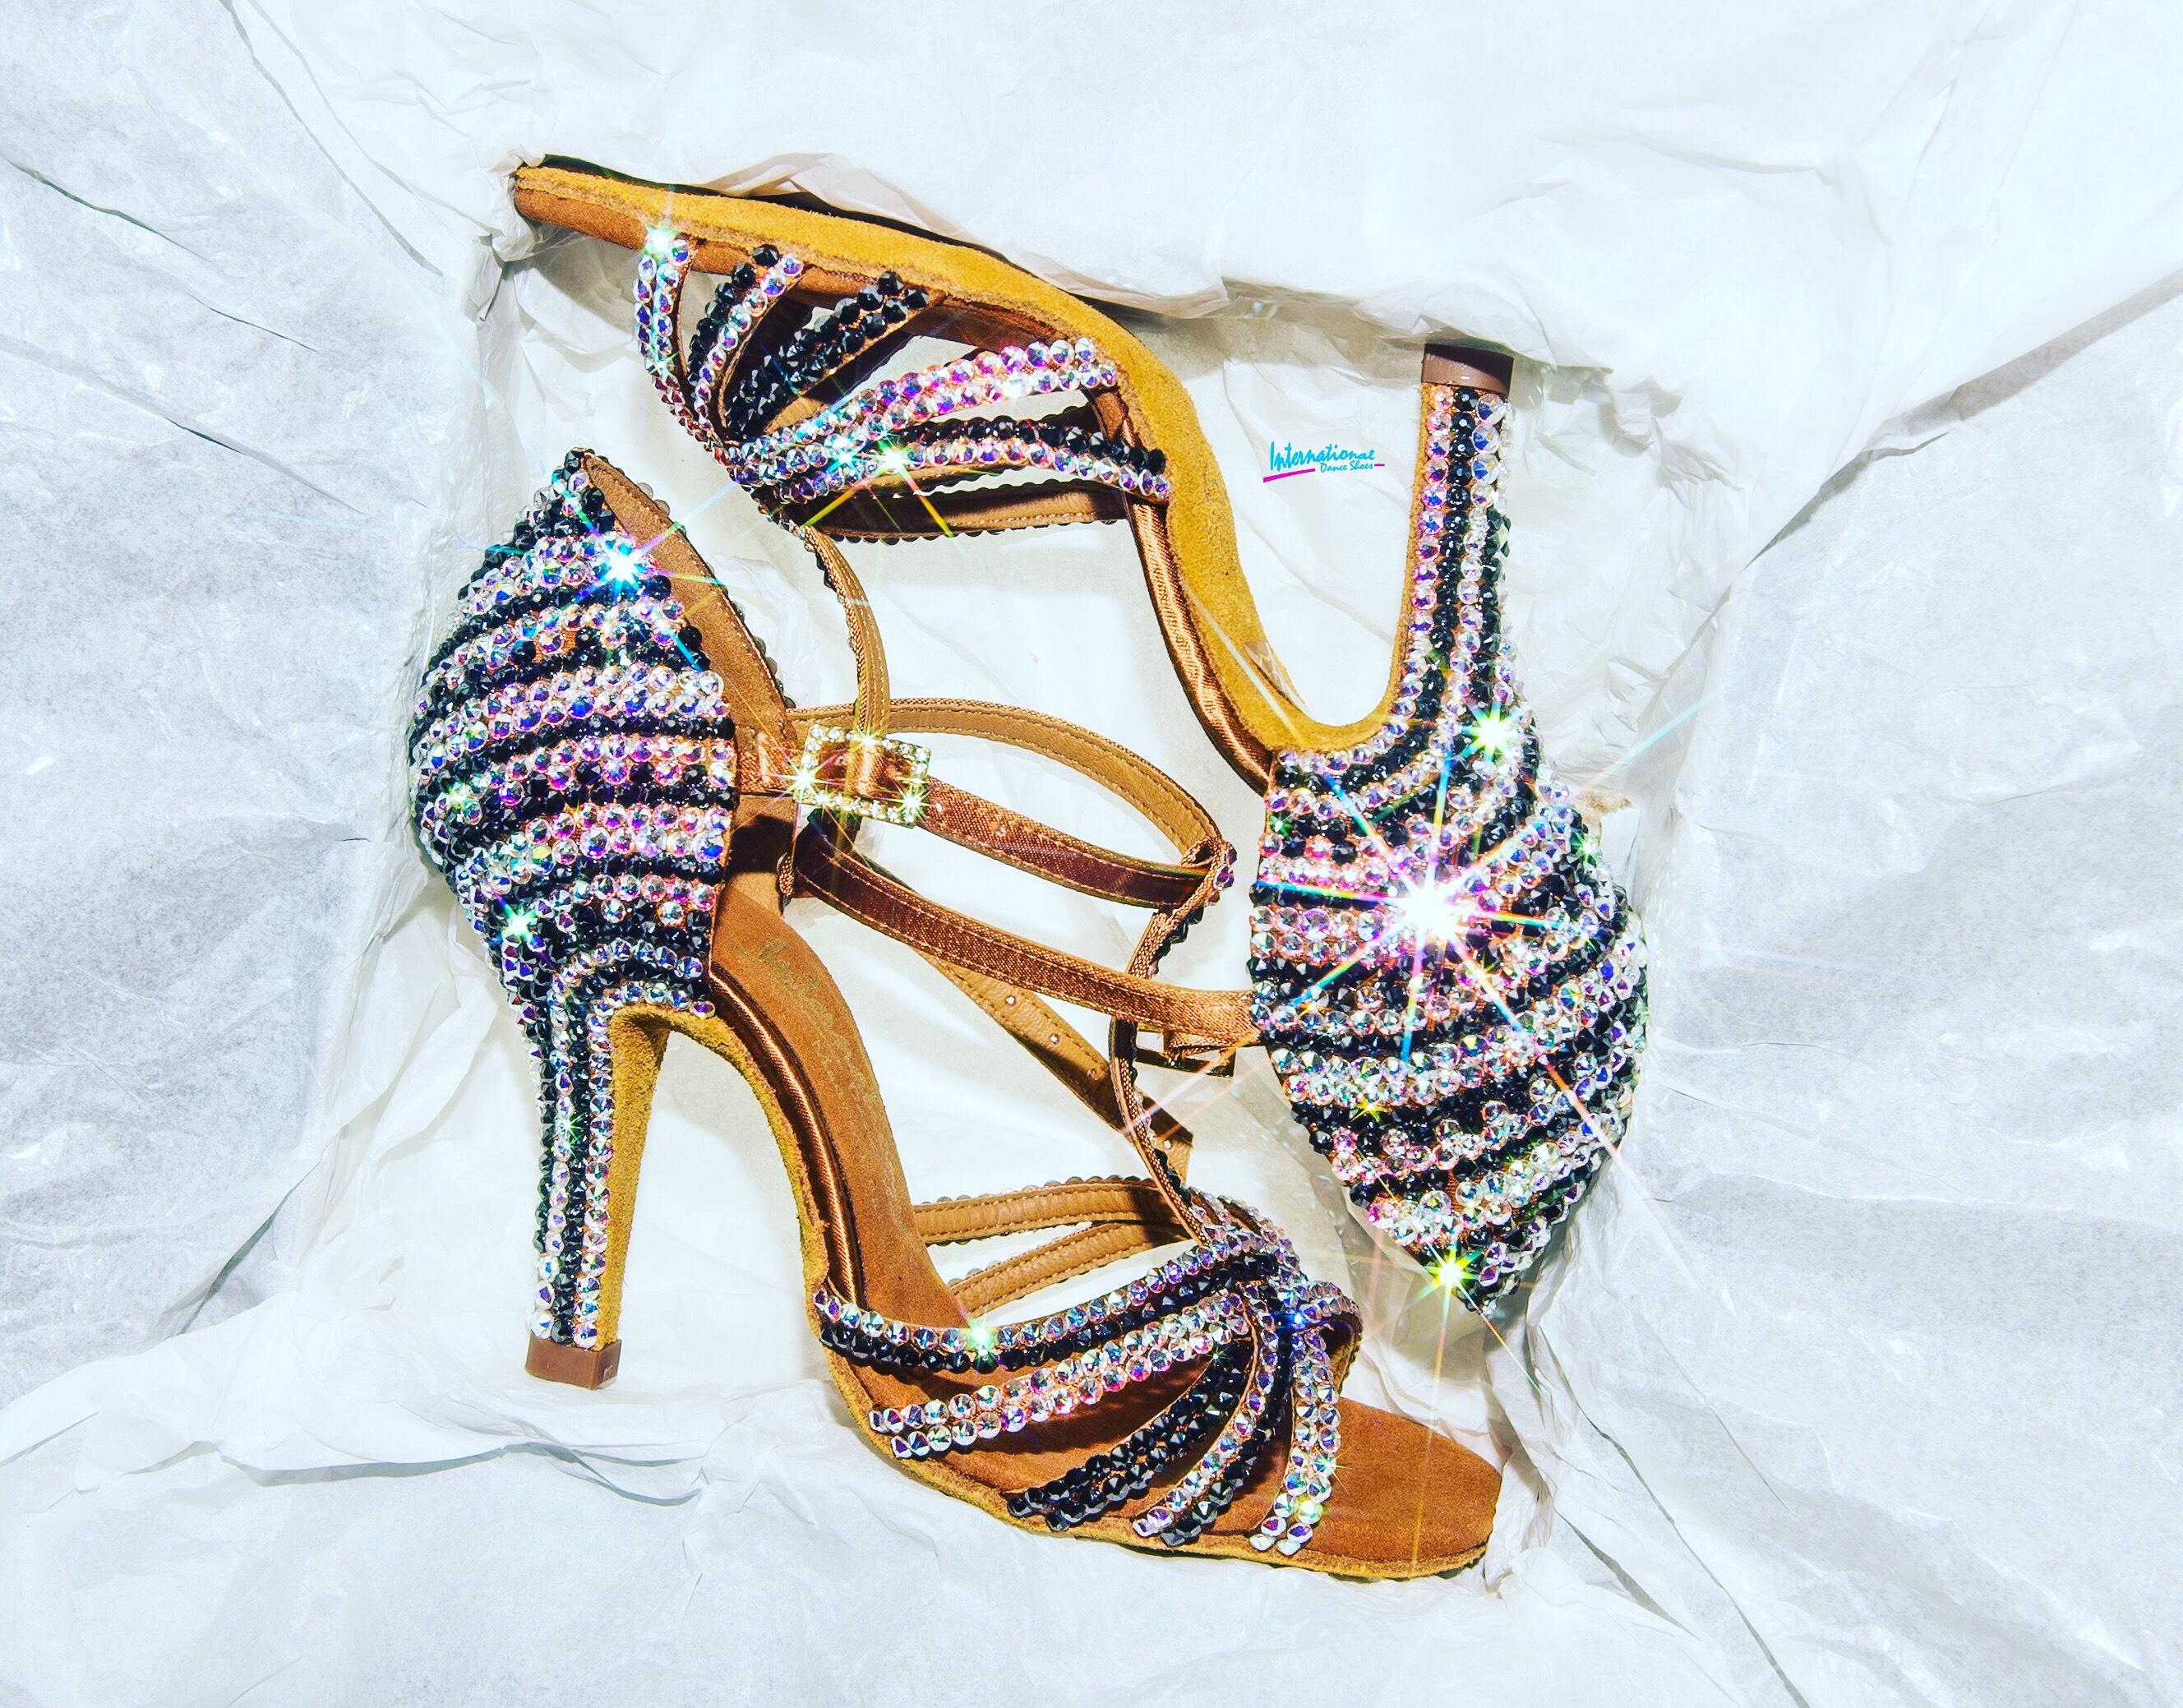 Swarovski Xirius Crystals now available! - International Dance Shoes 2e774ffe4b97